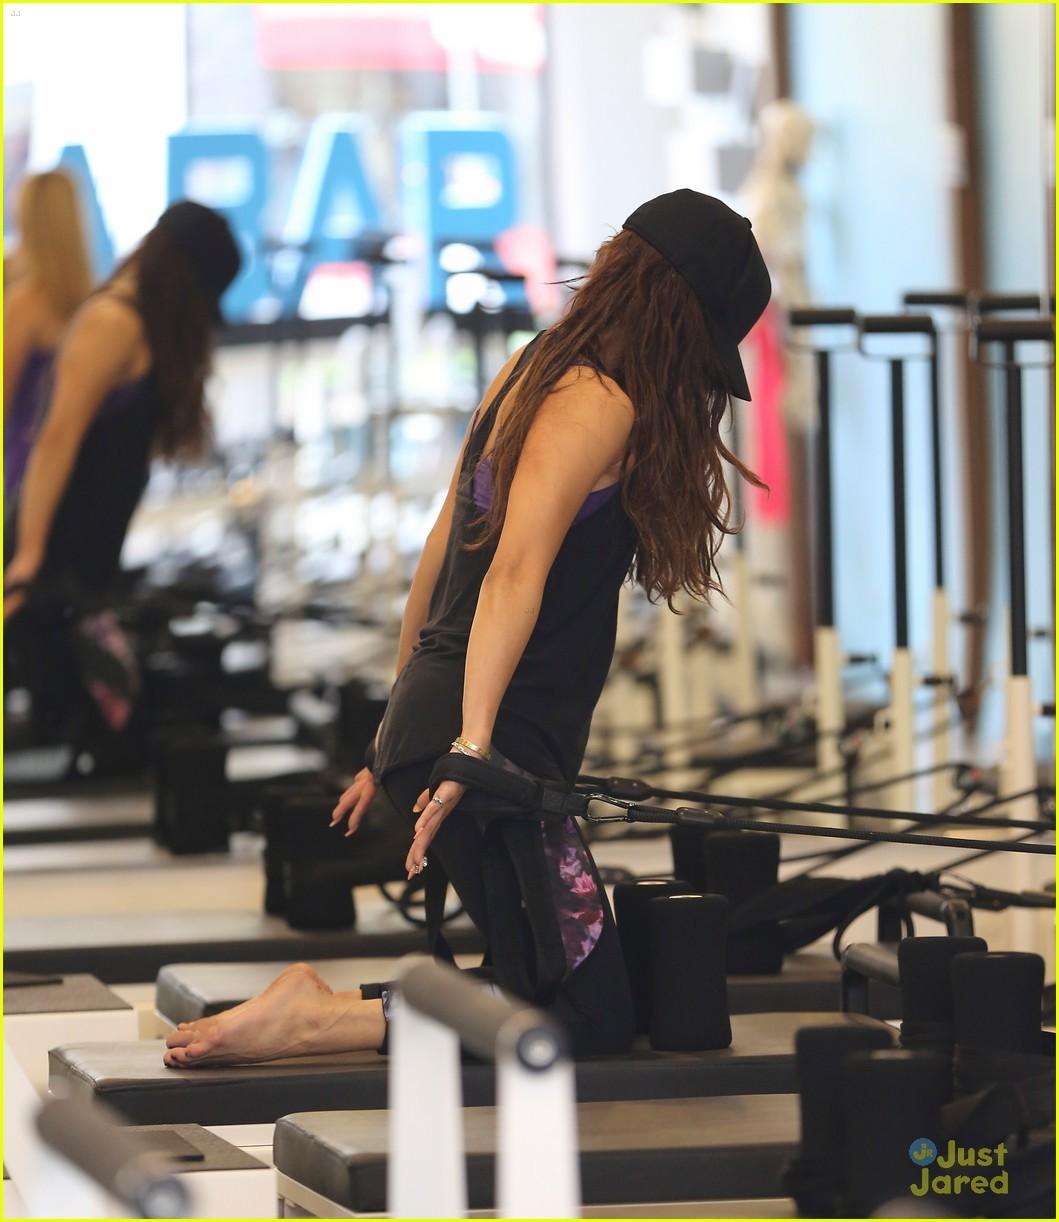 Michelle barton workout - 4 9